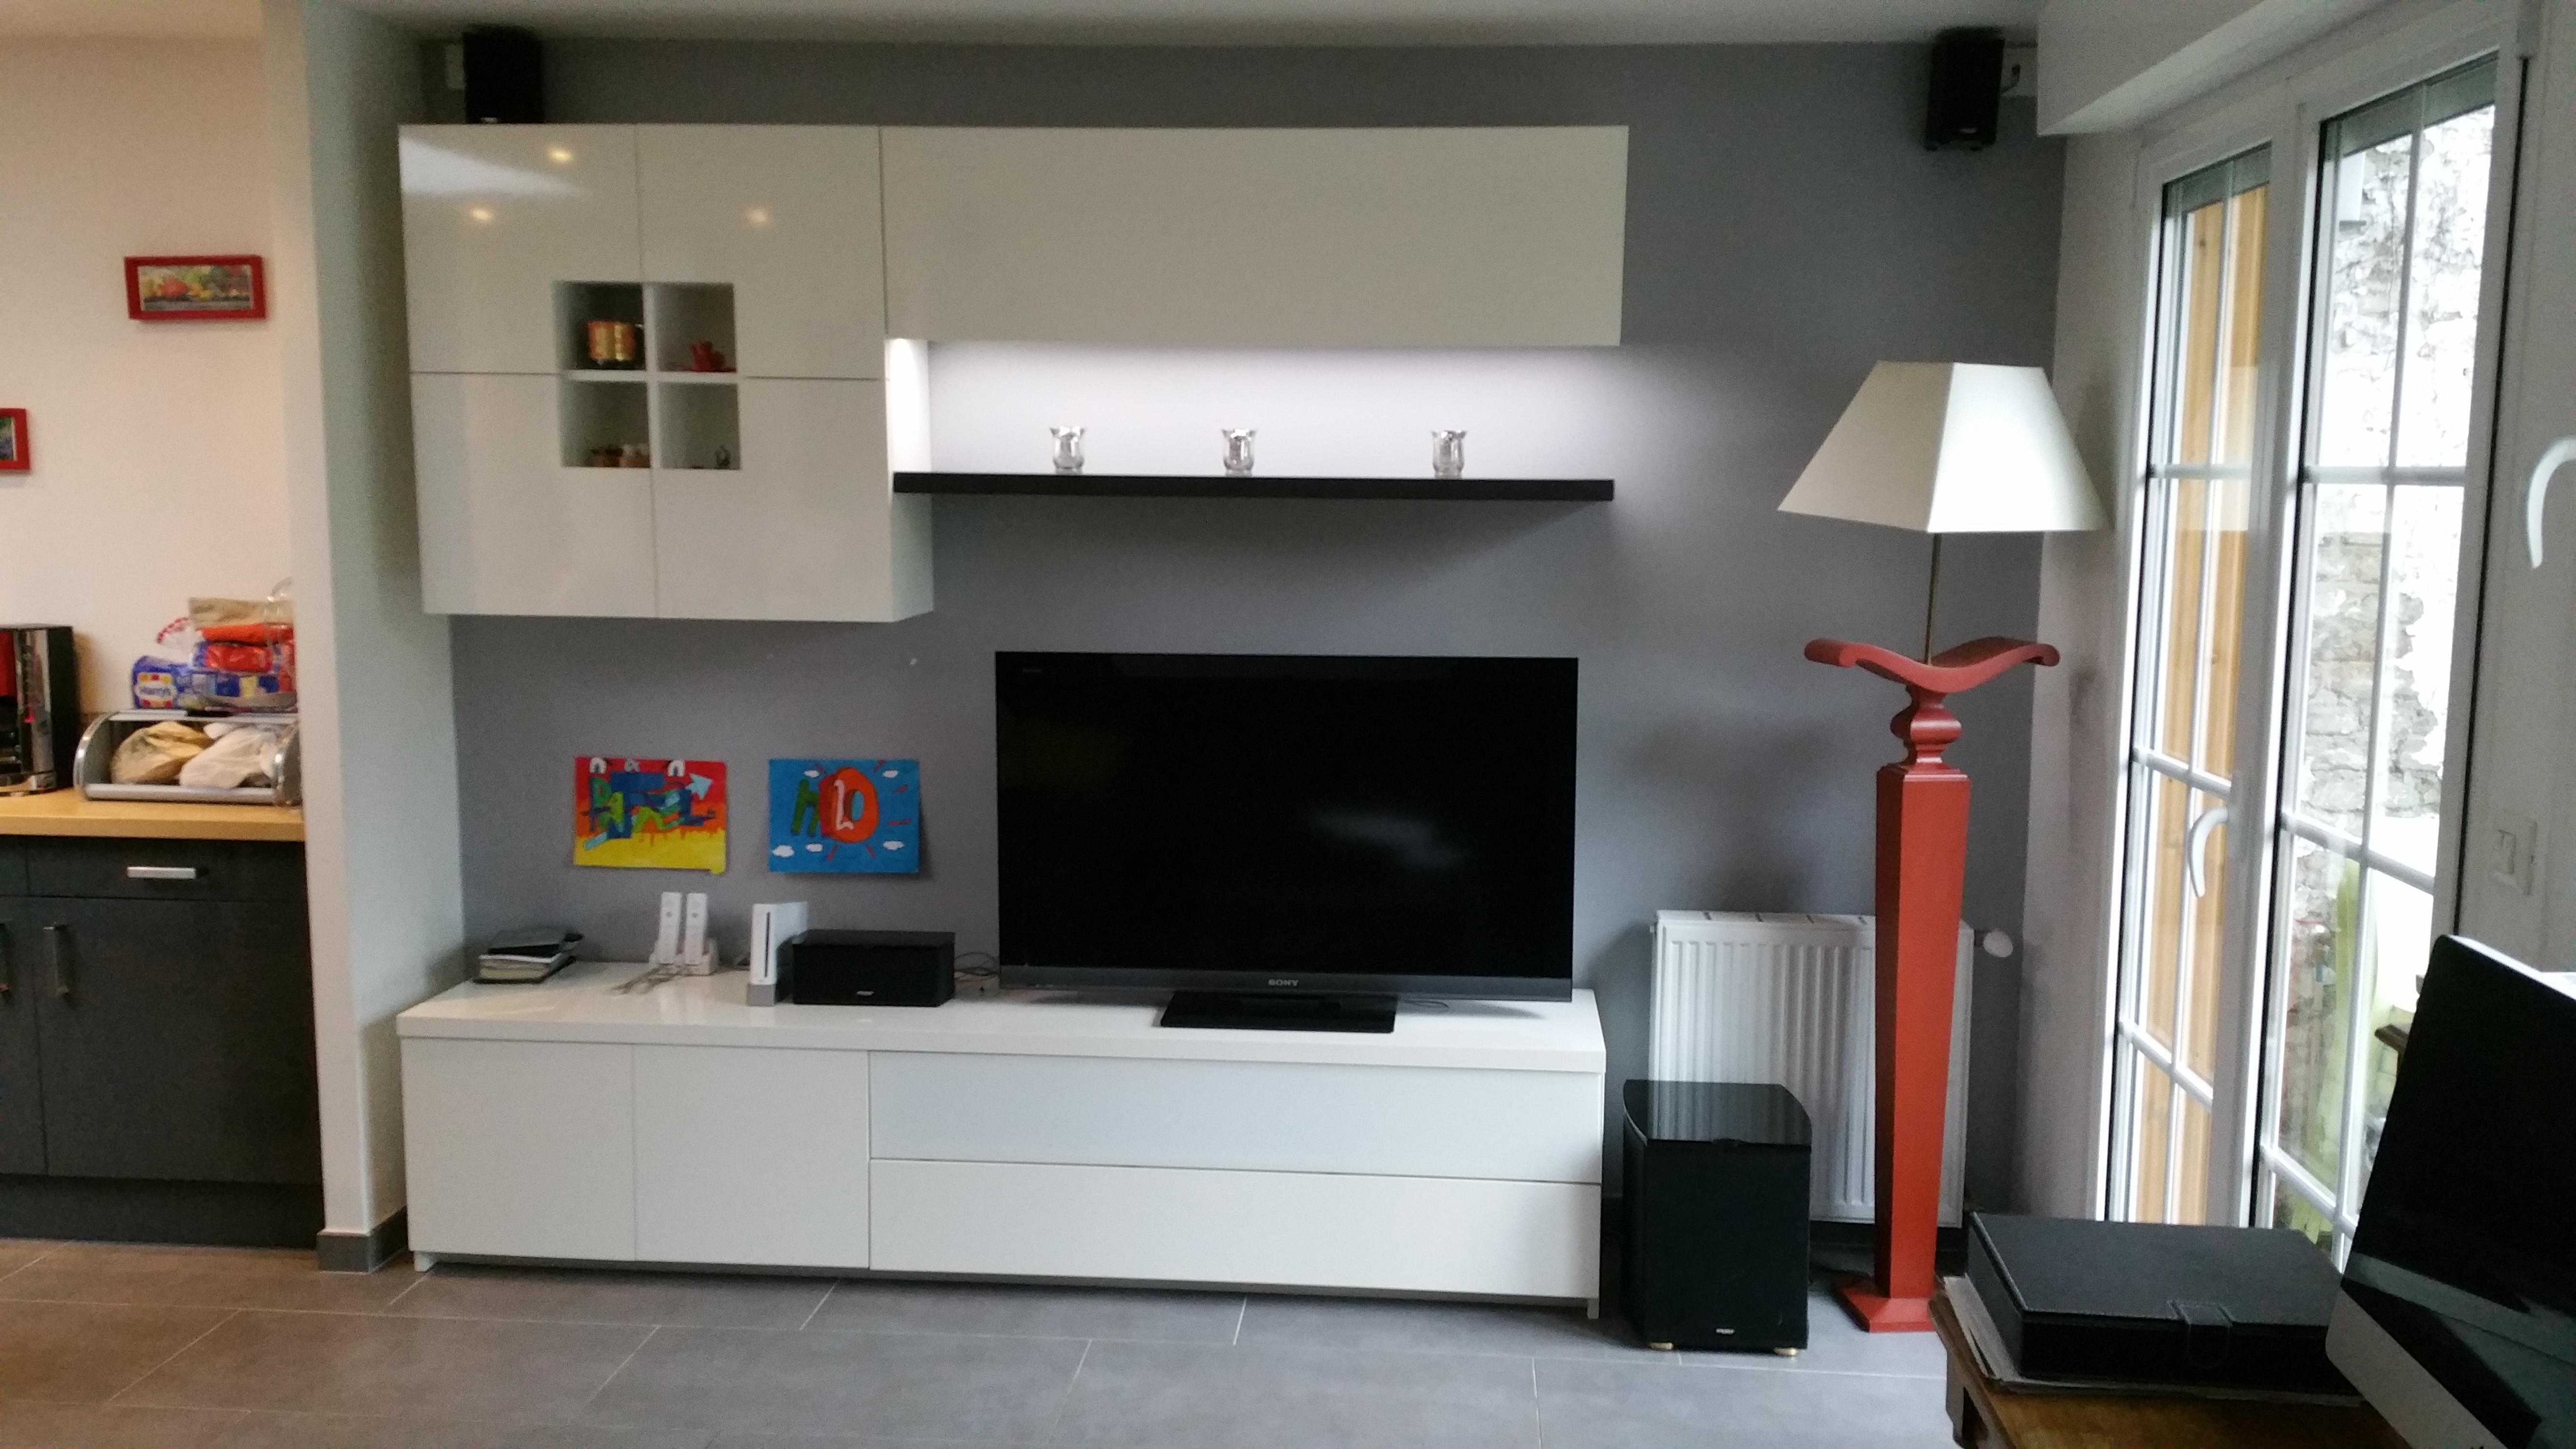 Meuble Tv Amg Agencement # Agencement Meuble Tv